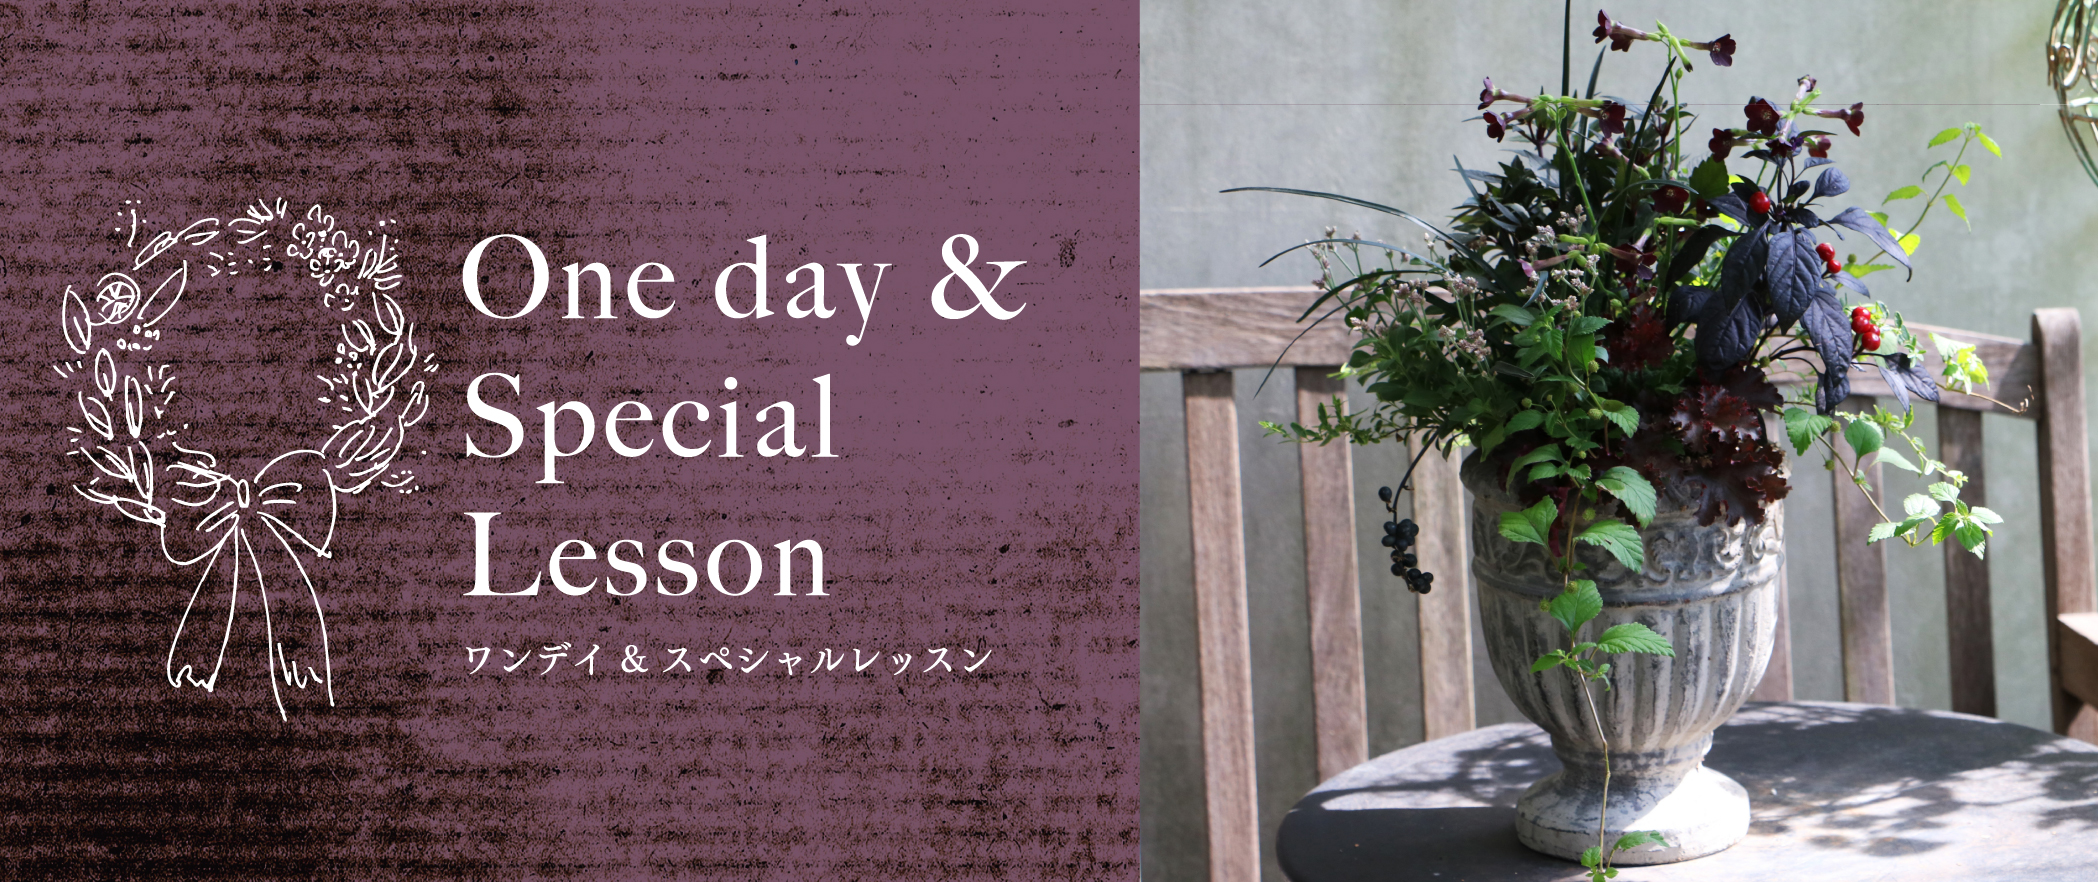 One day & Special Lesson ワンデイ&スペシャルレッスン